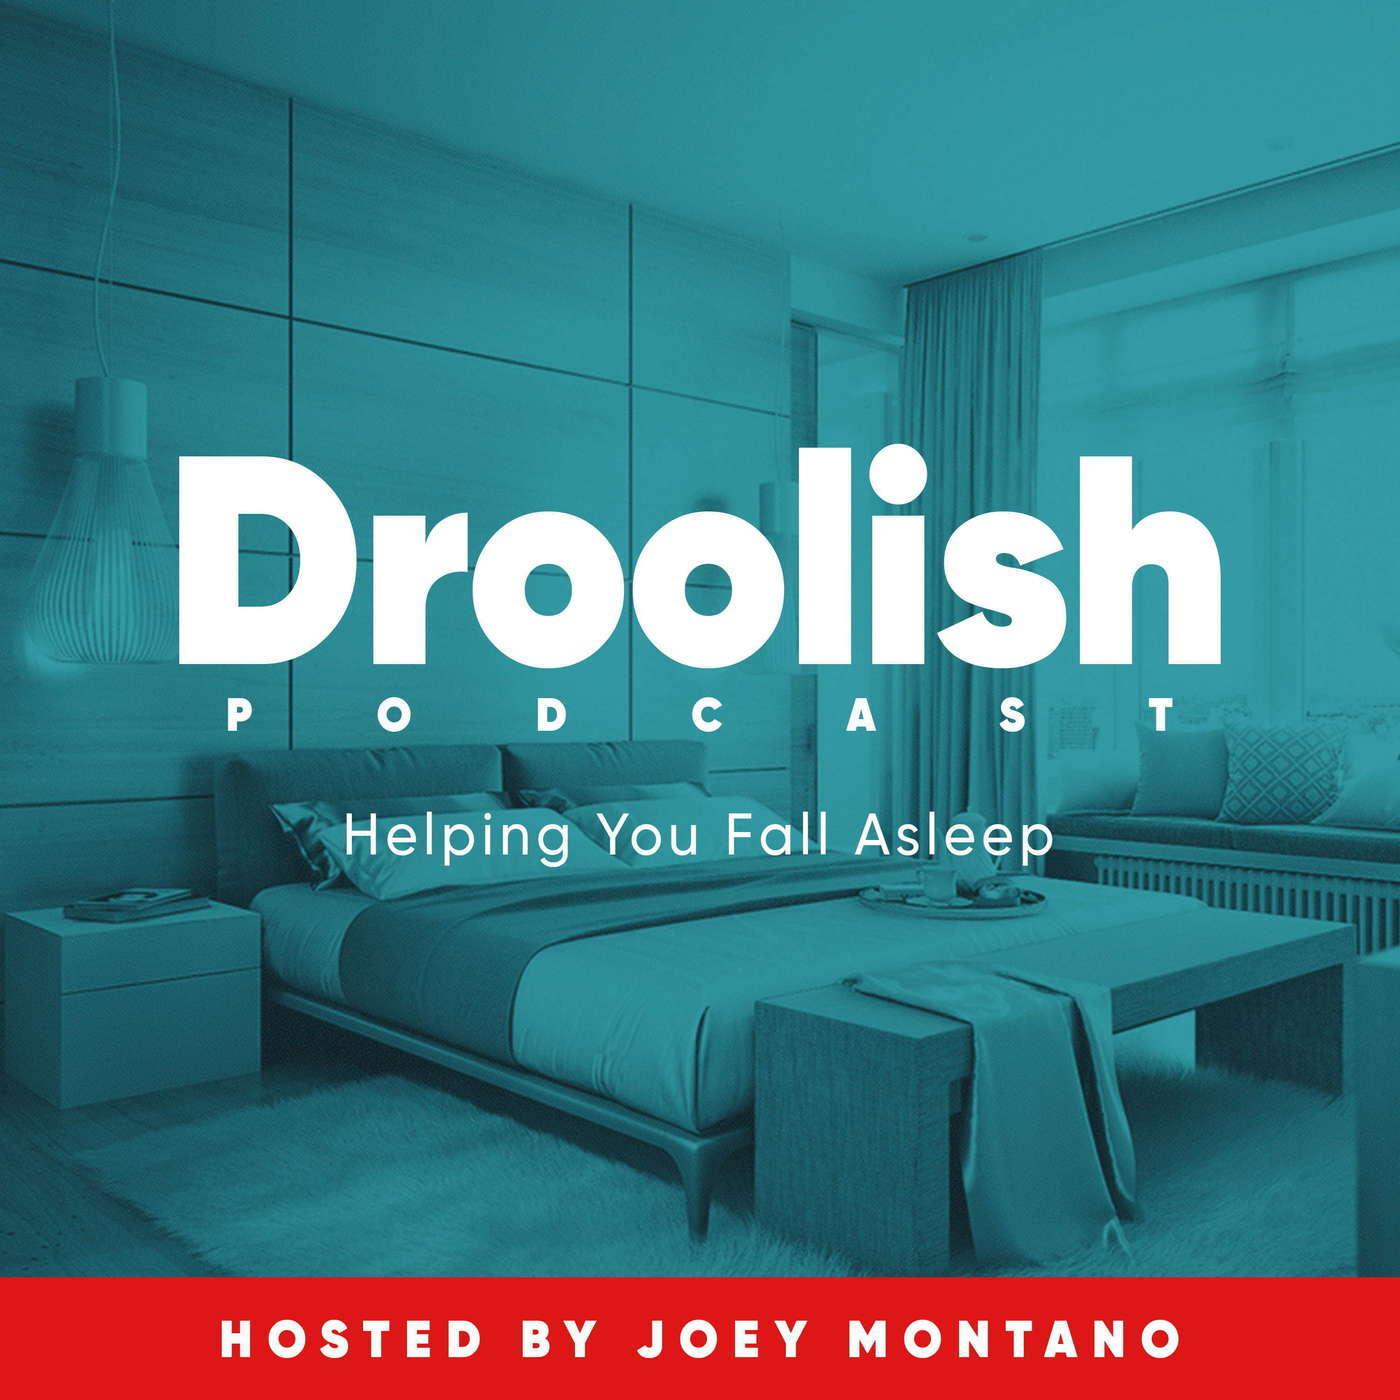 Droolish: Sleep & Relaxation Podcast 27-good-night-sleepyheads: 45 Minutes of Saying Goodnight To Various 1980's Baby Names [sleep 🌧️]